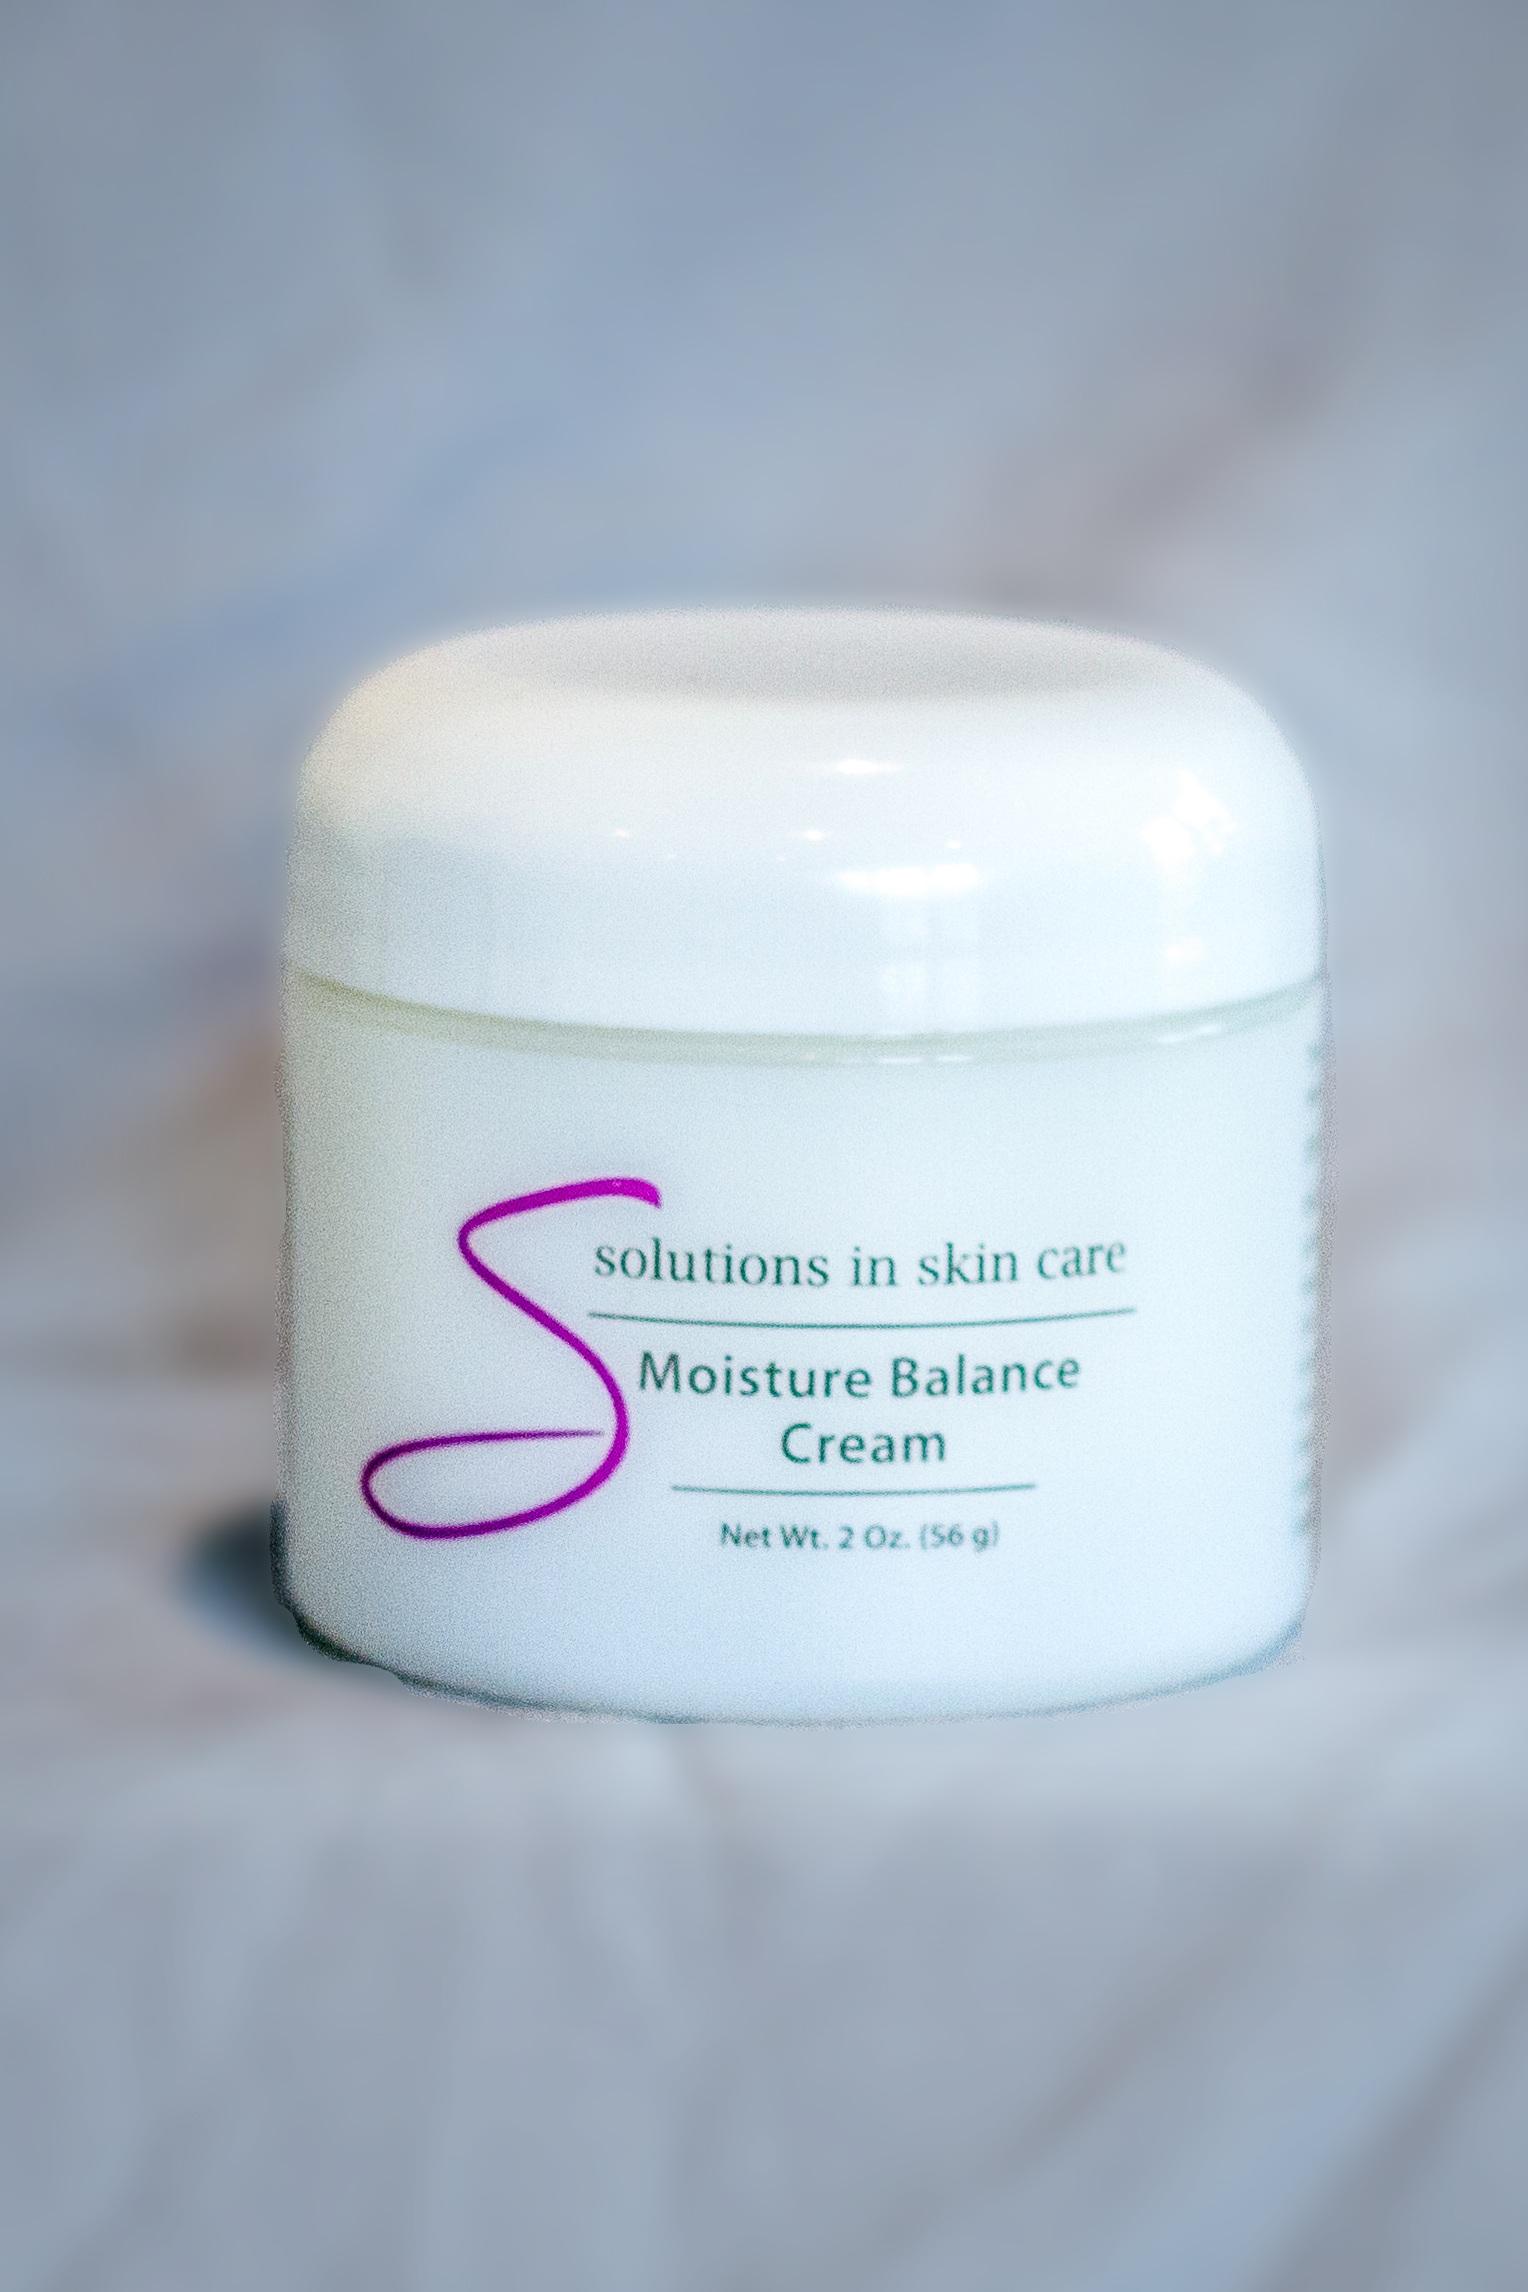 moisture-balance-cream-solutions-in-skin-care.jpg